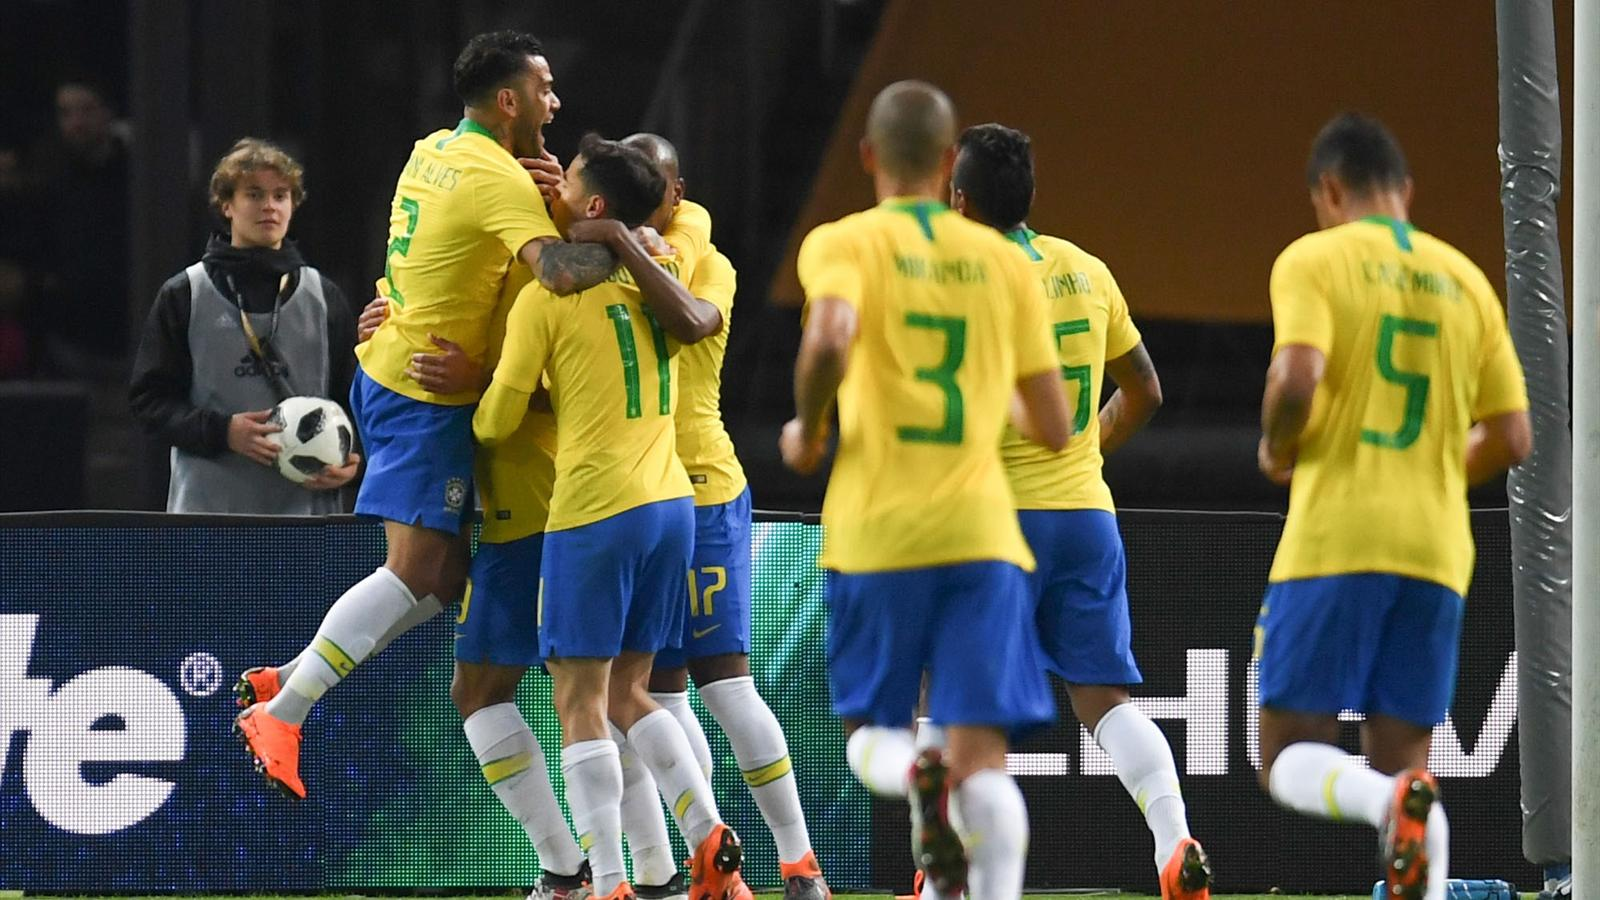 Brasile-Svizzera in Diretta tv e Live-Streaming - Mondiali 2018 - Calcio - Eurosport